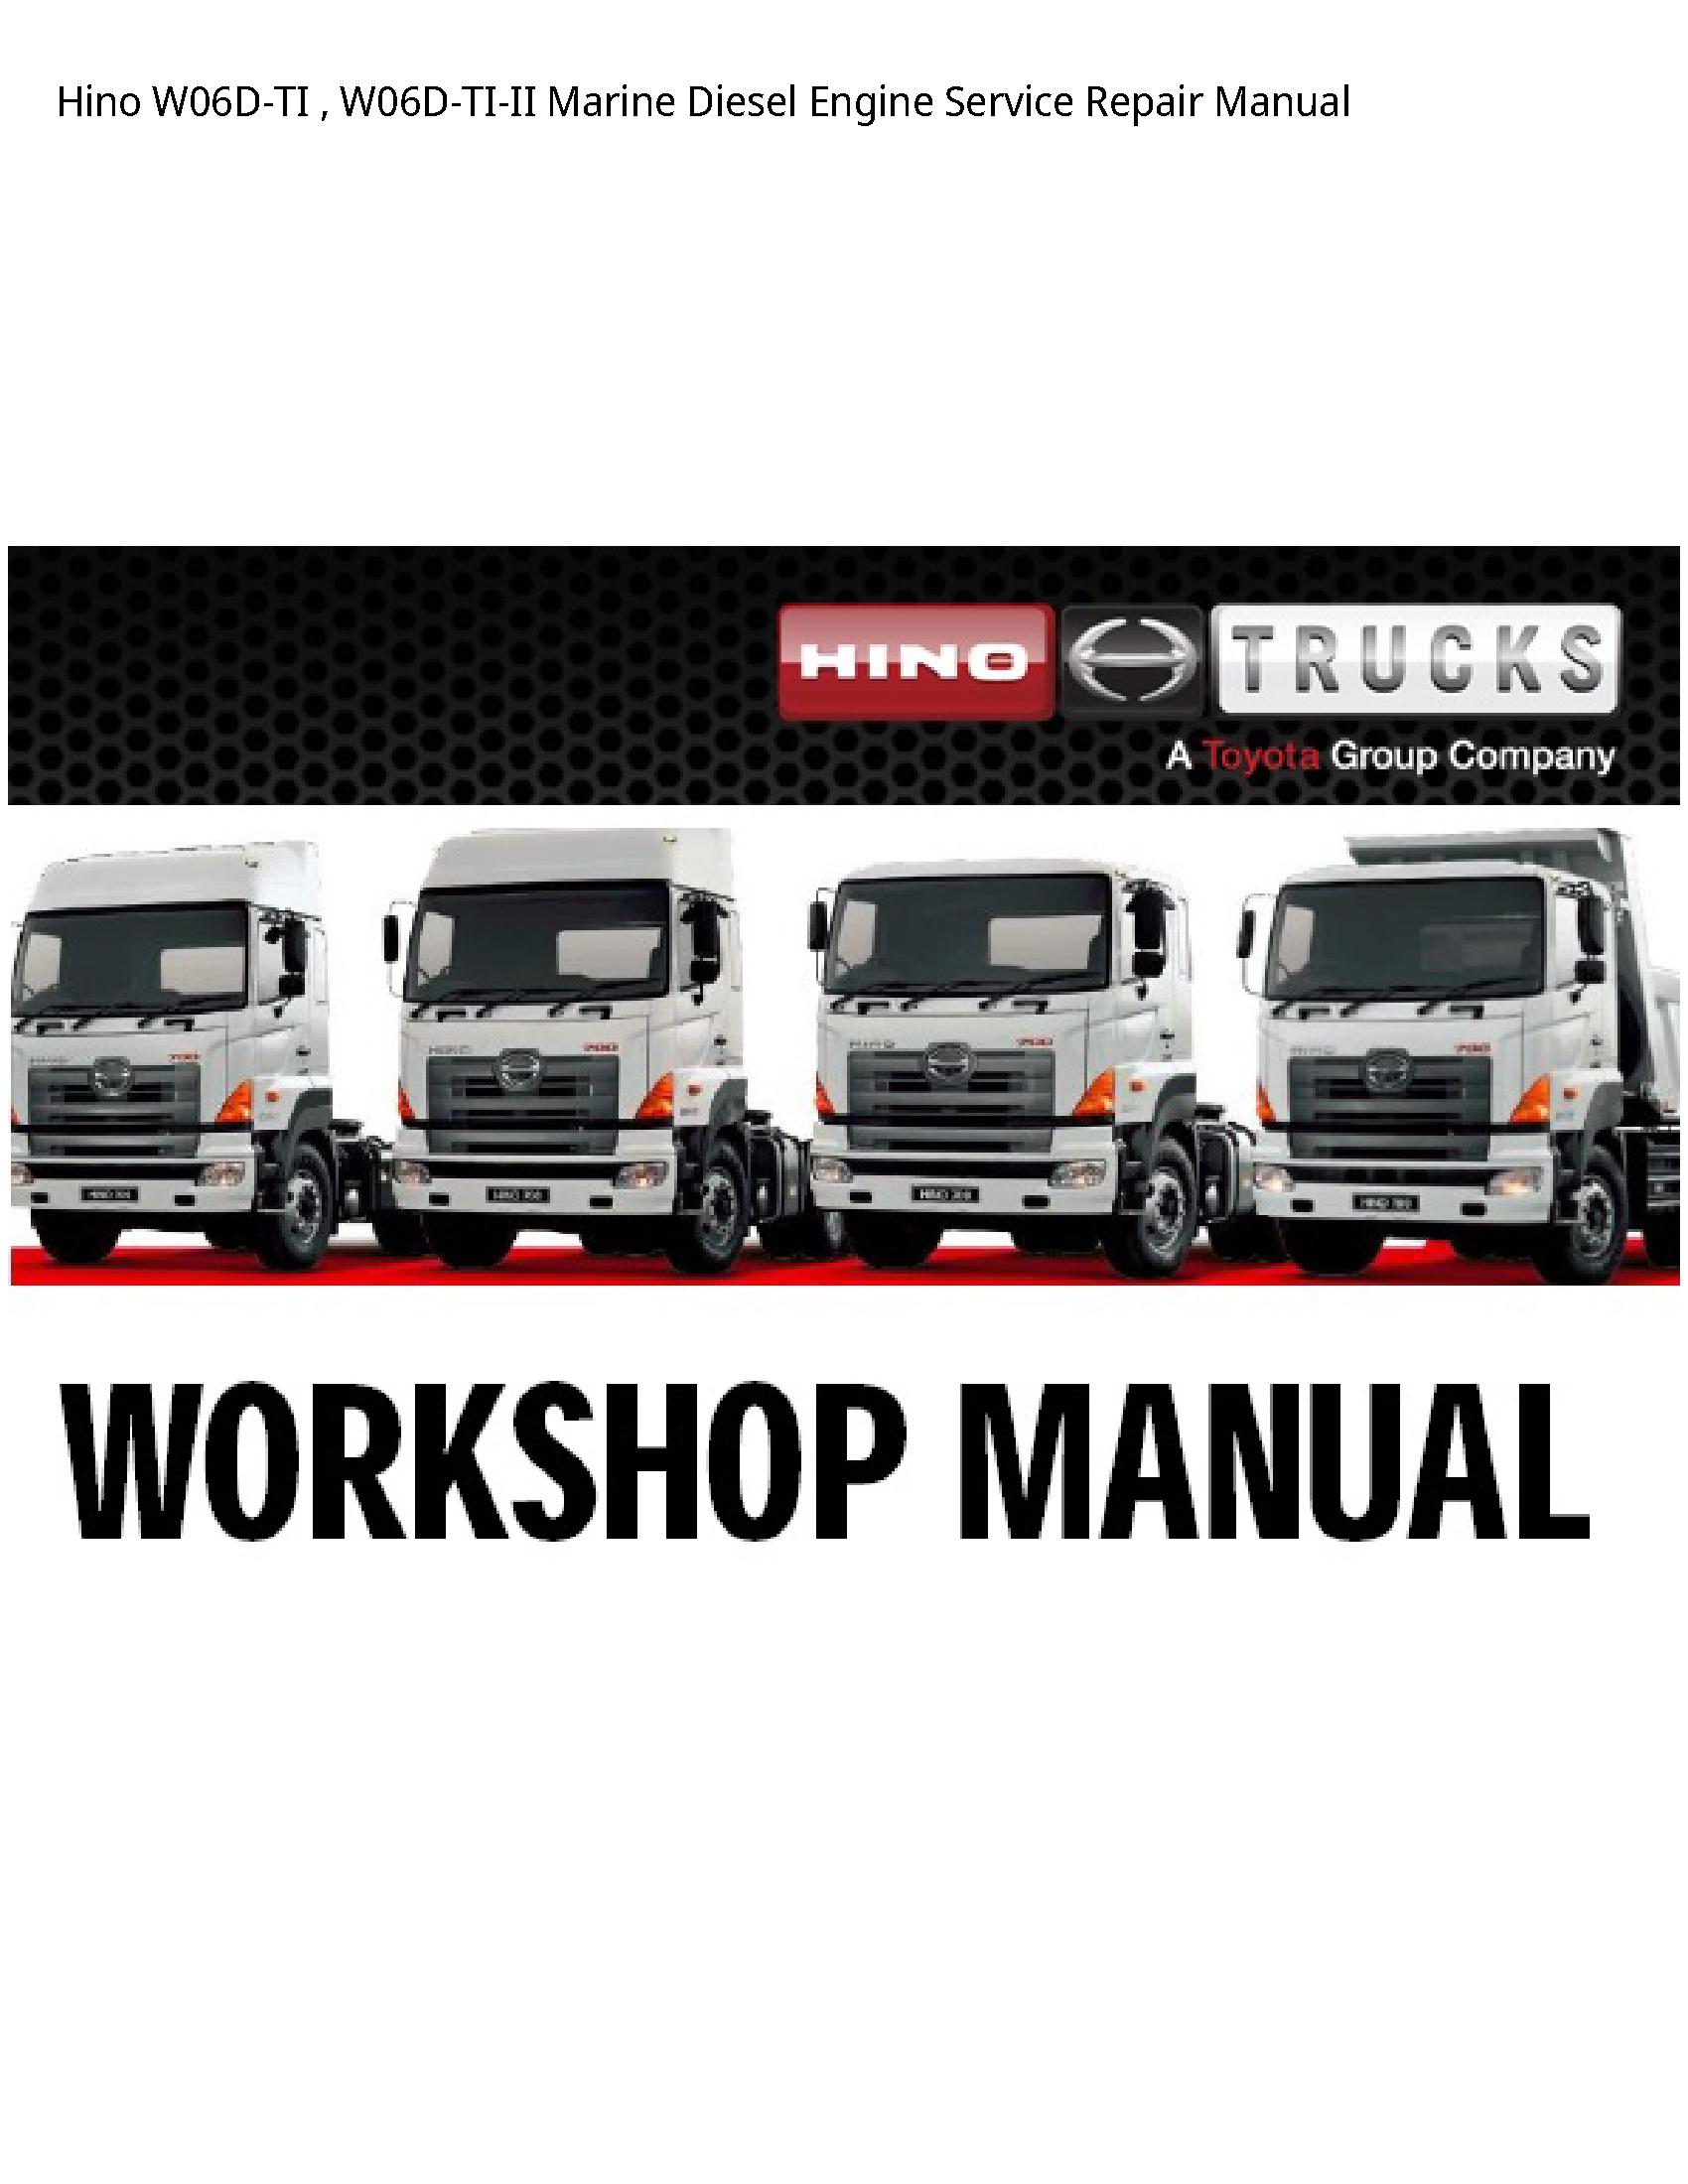 Hino W06D-TI Marine Diesel Engine manual